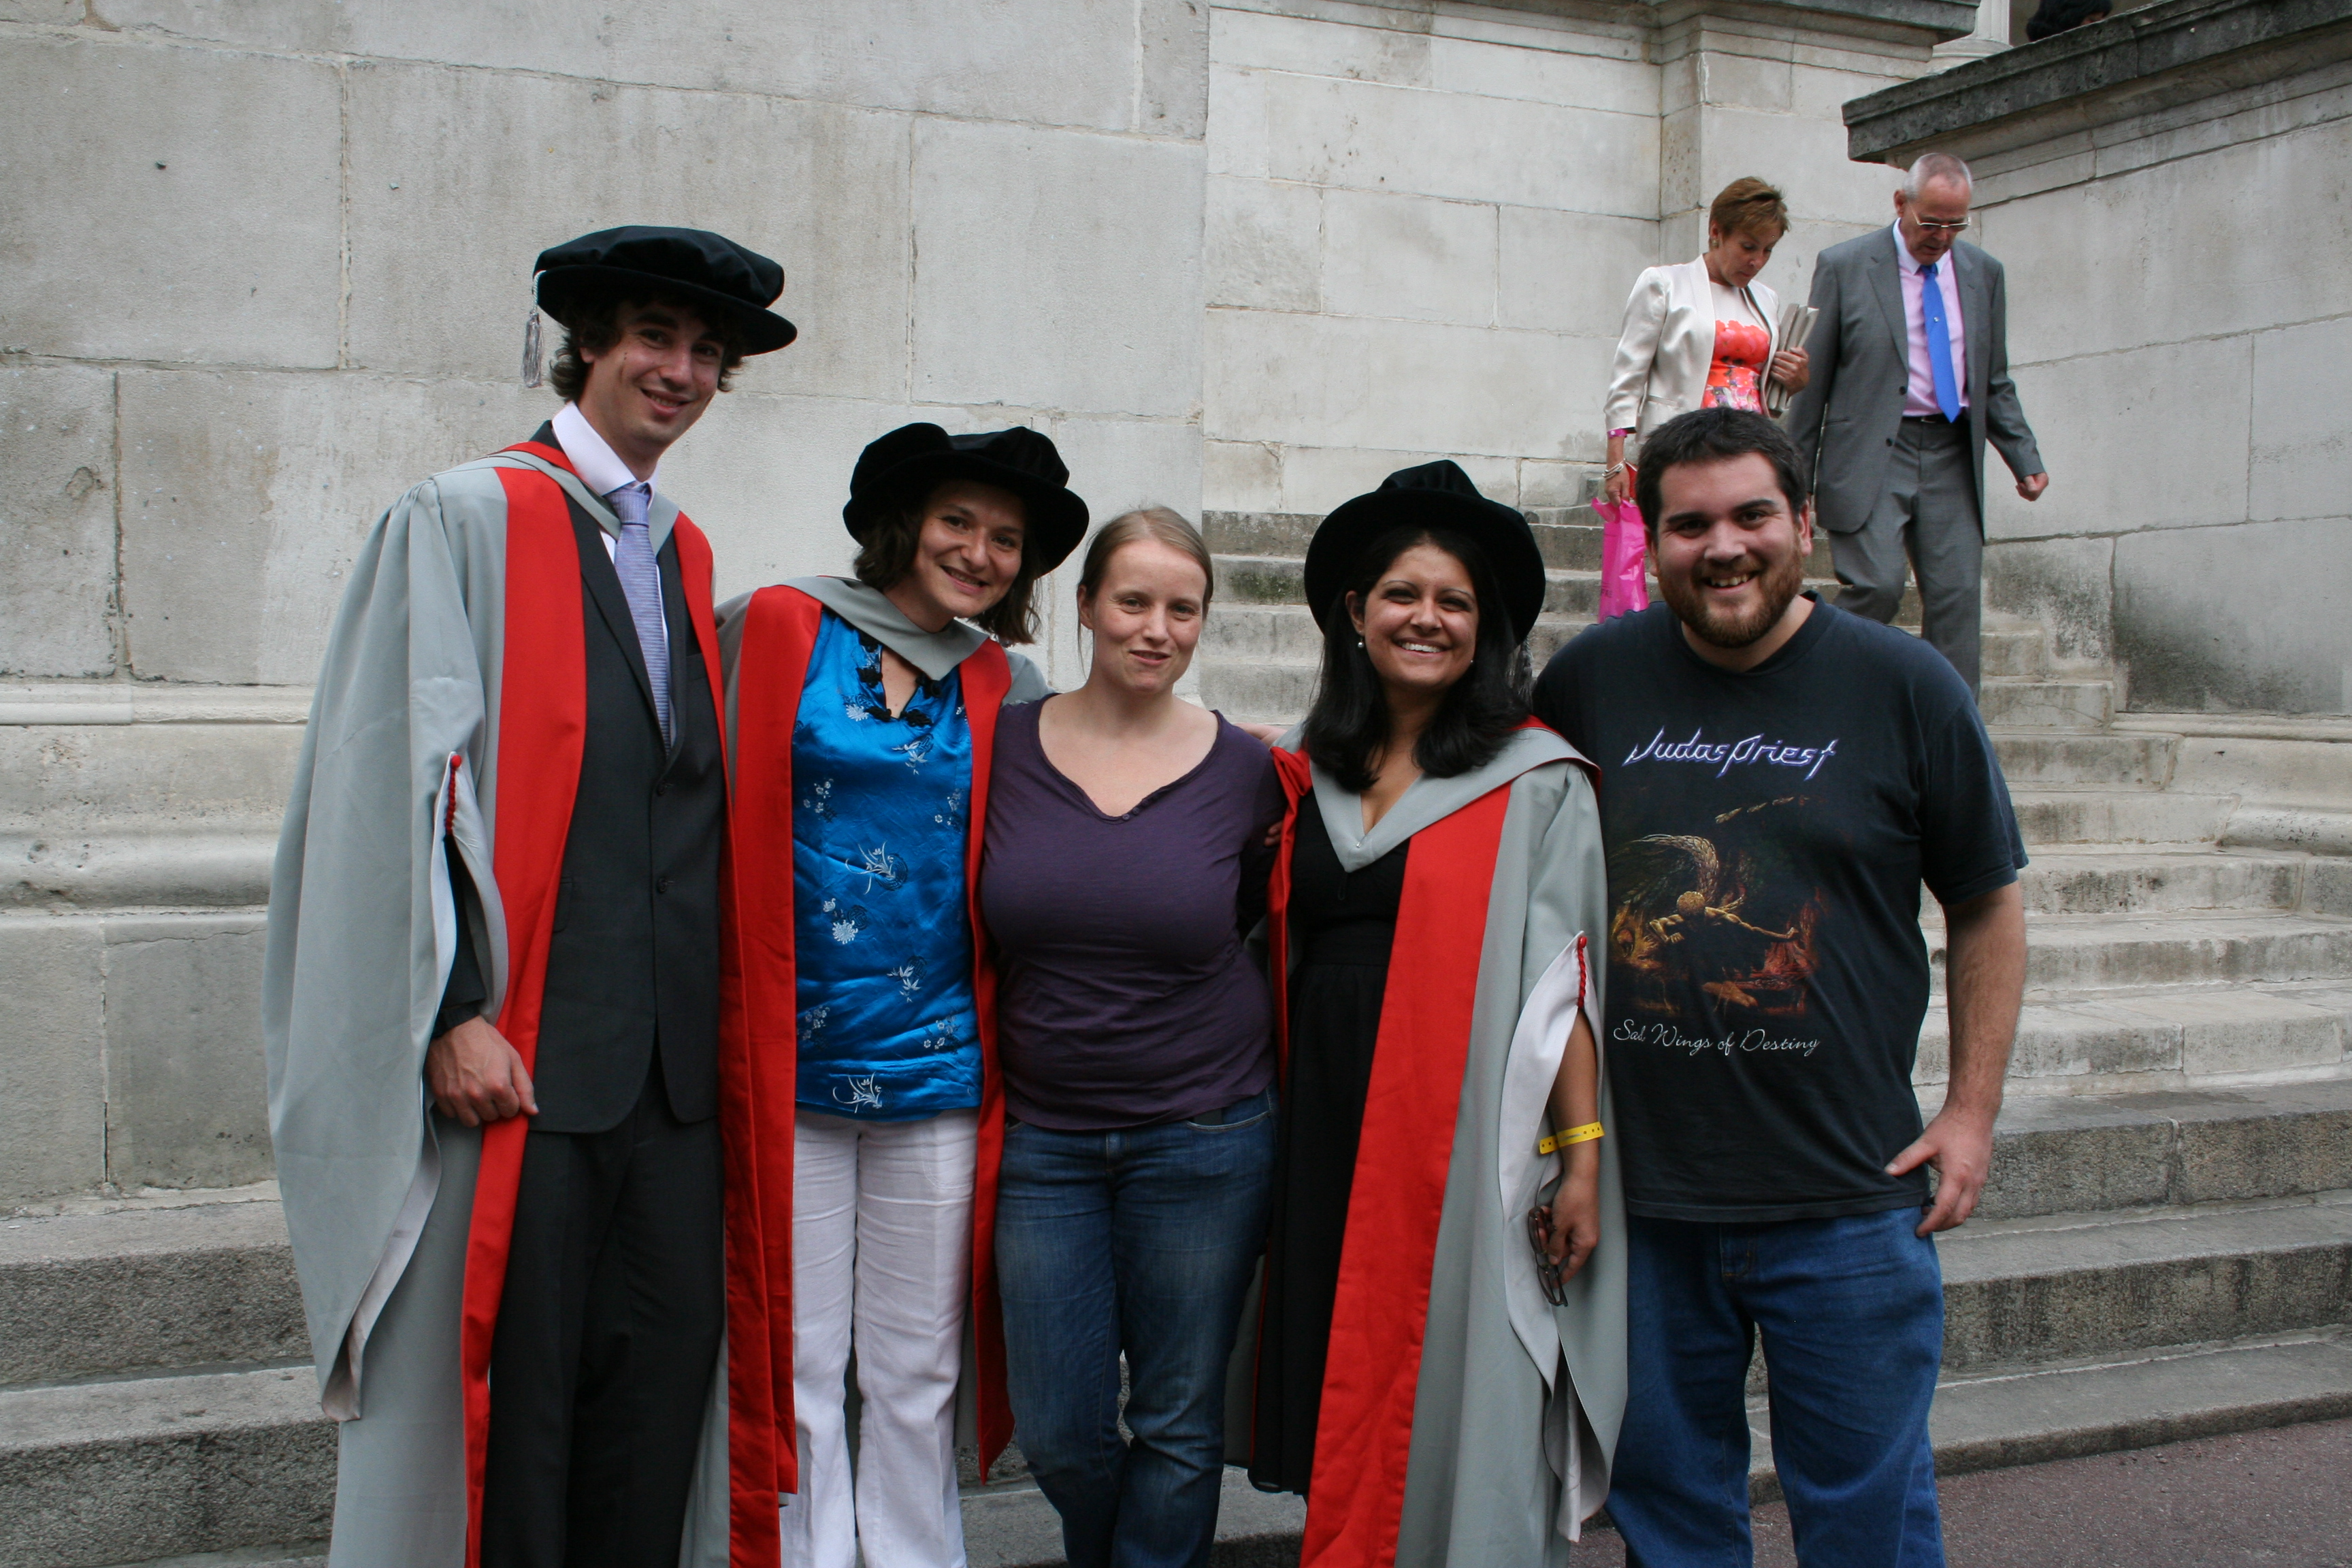 GEE Phd Graduation Ceremony 2013 UCL